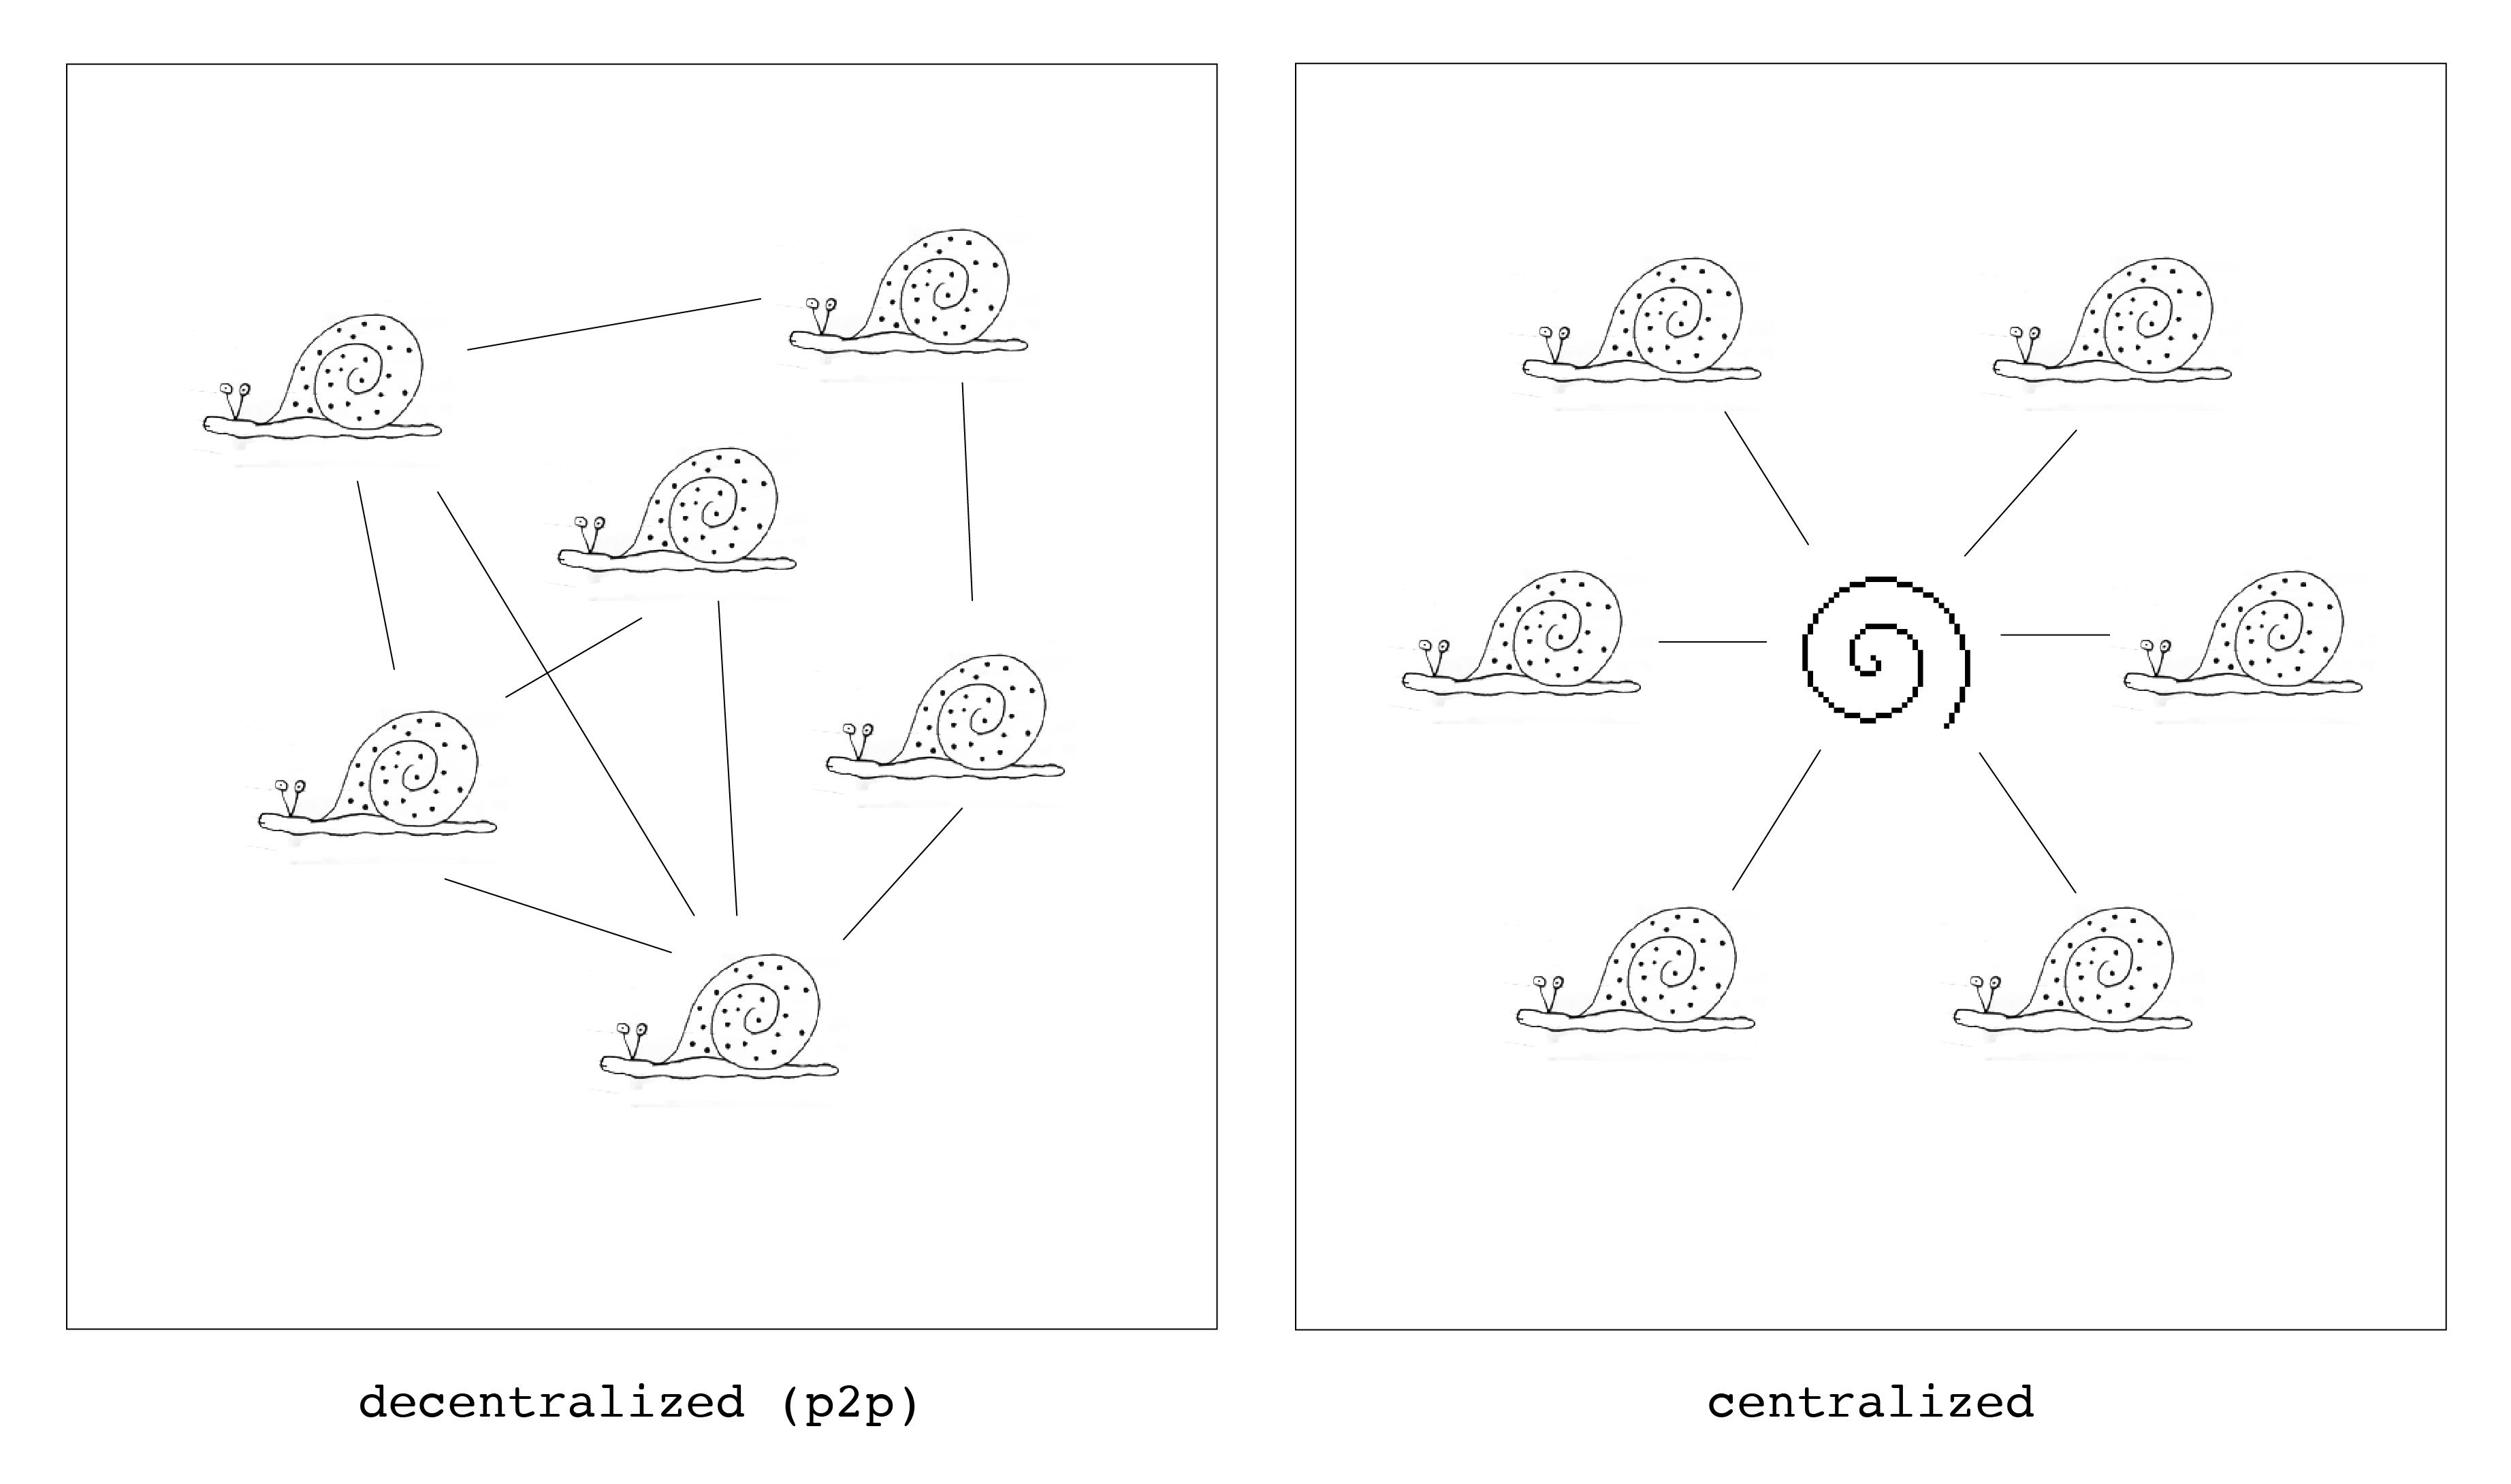 decentralized-centralized.jpg